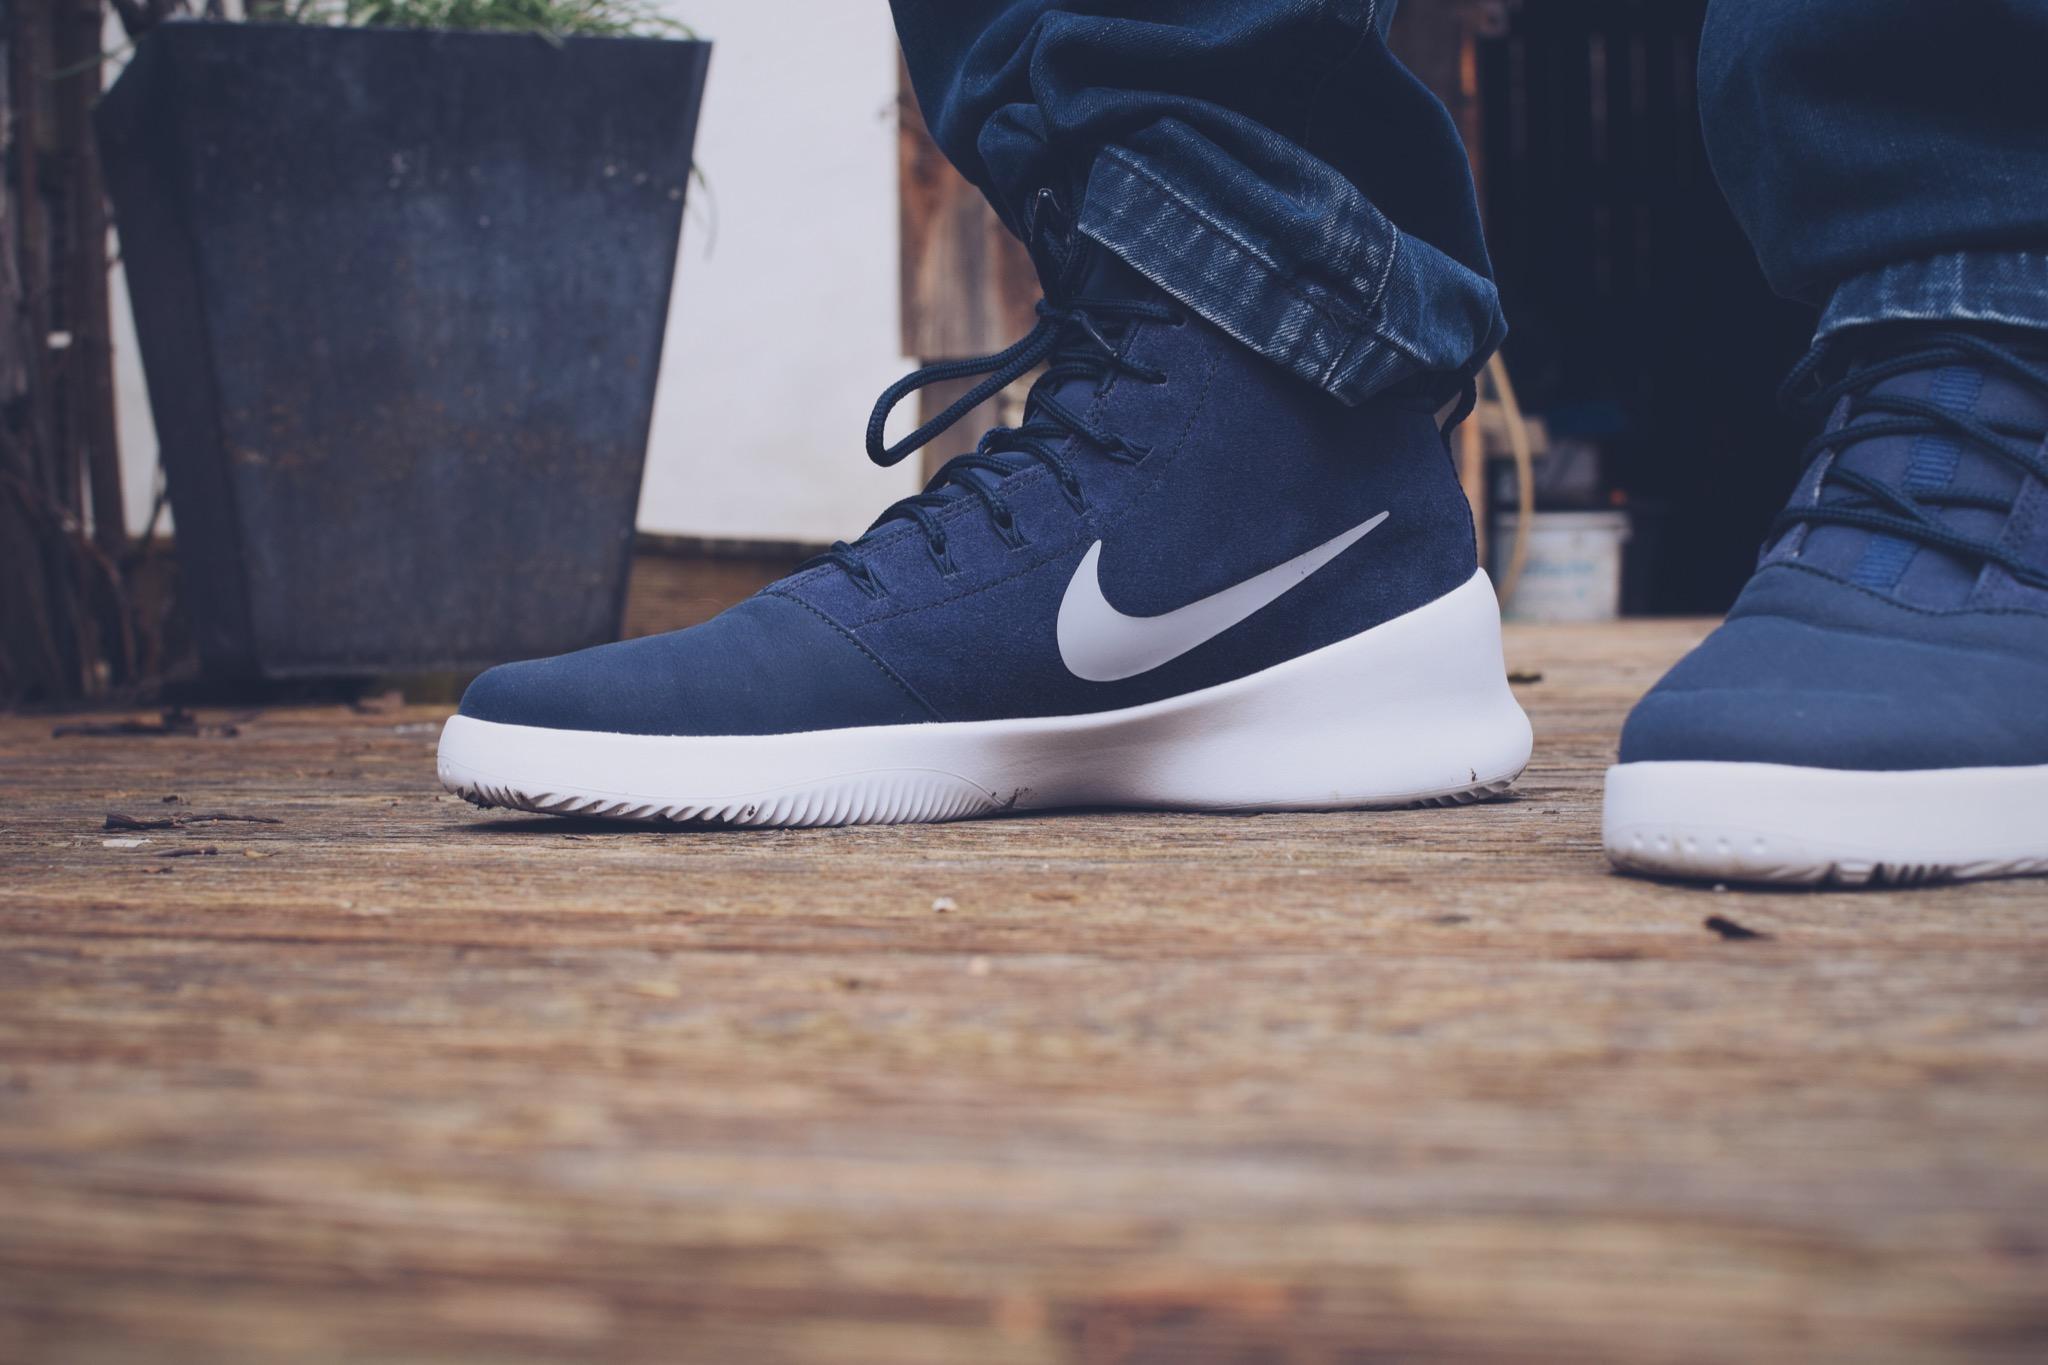 Nike_Hyperfuse_Foot_Locker_0166